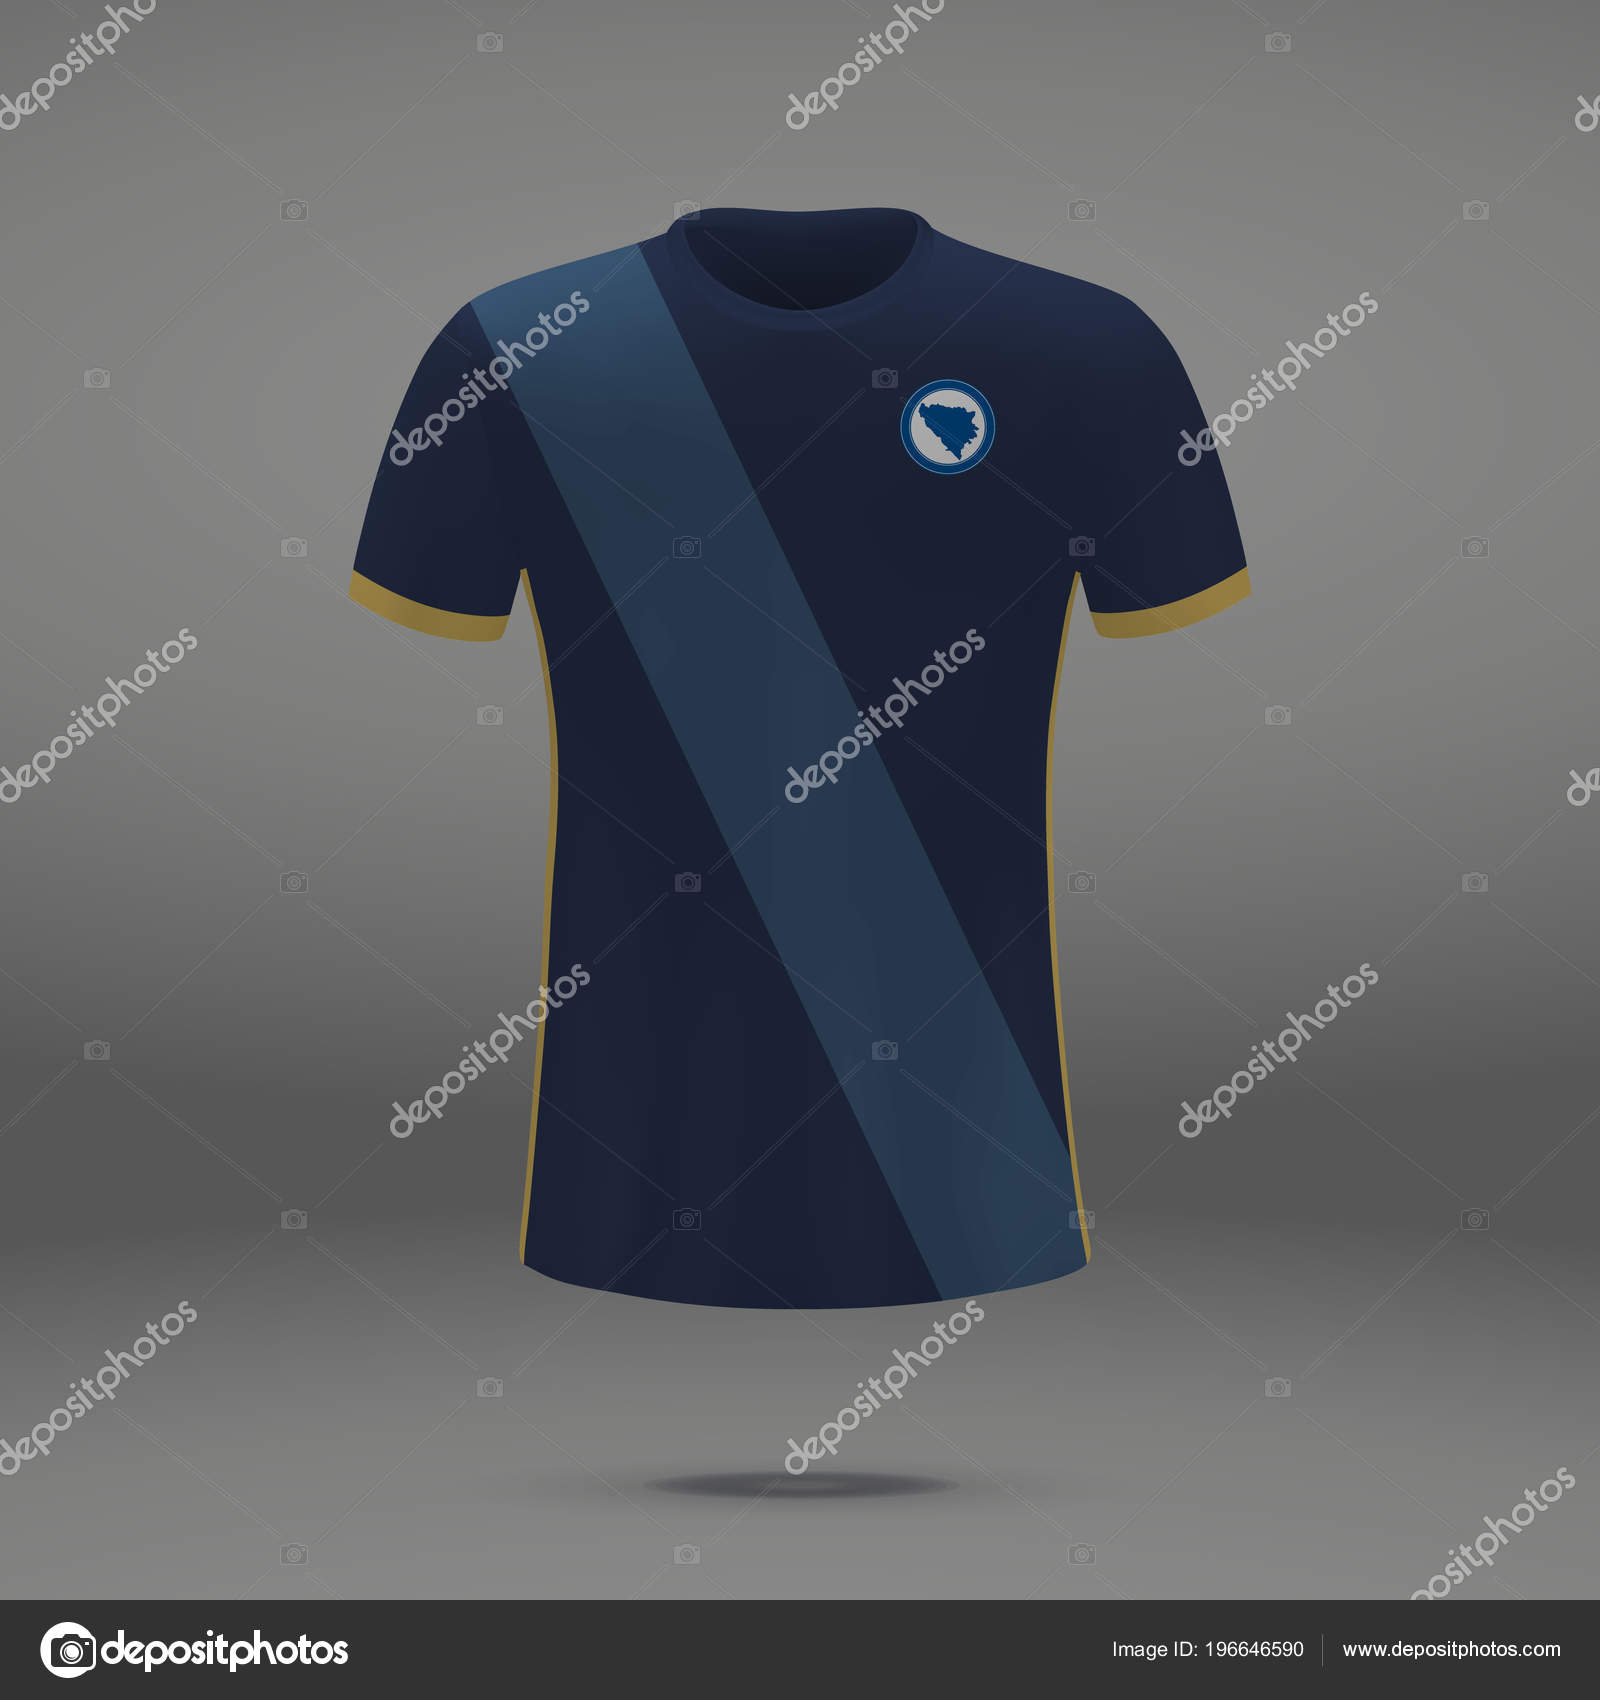 e6319f957 Football Kit Bosnia 2018 Shirt Template Soccer Jersey Vector Illustration —  Stock Vector